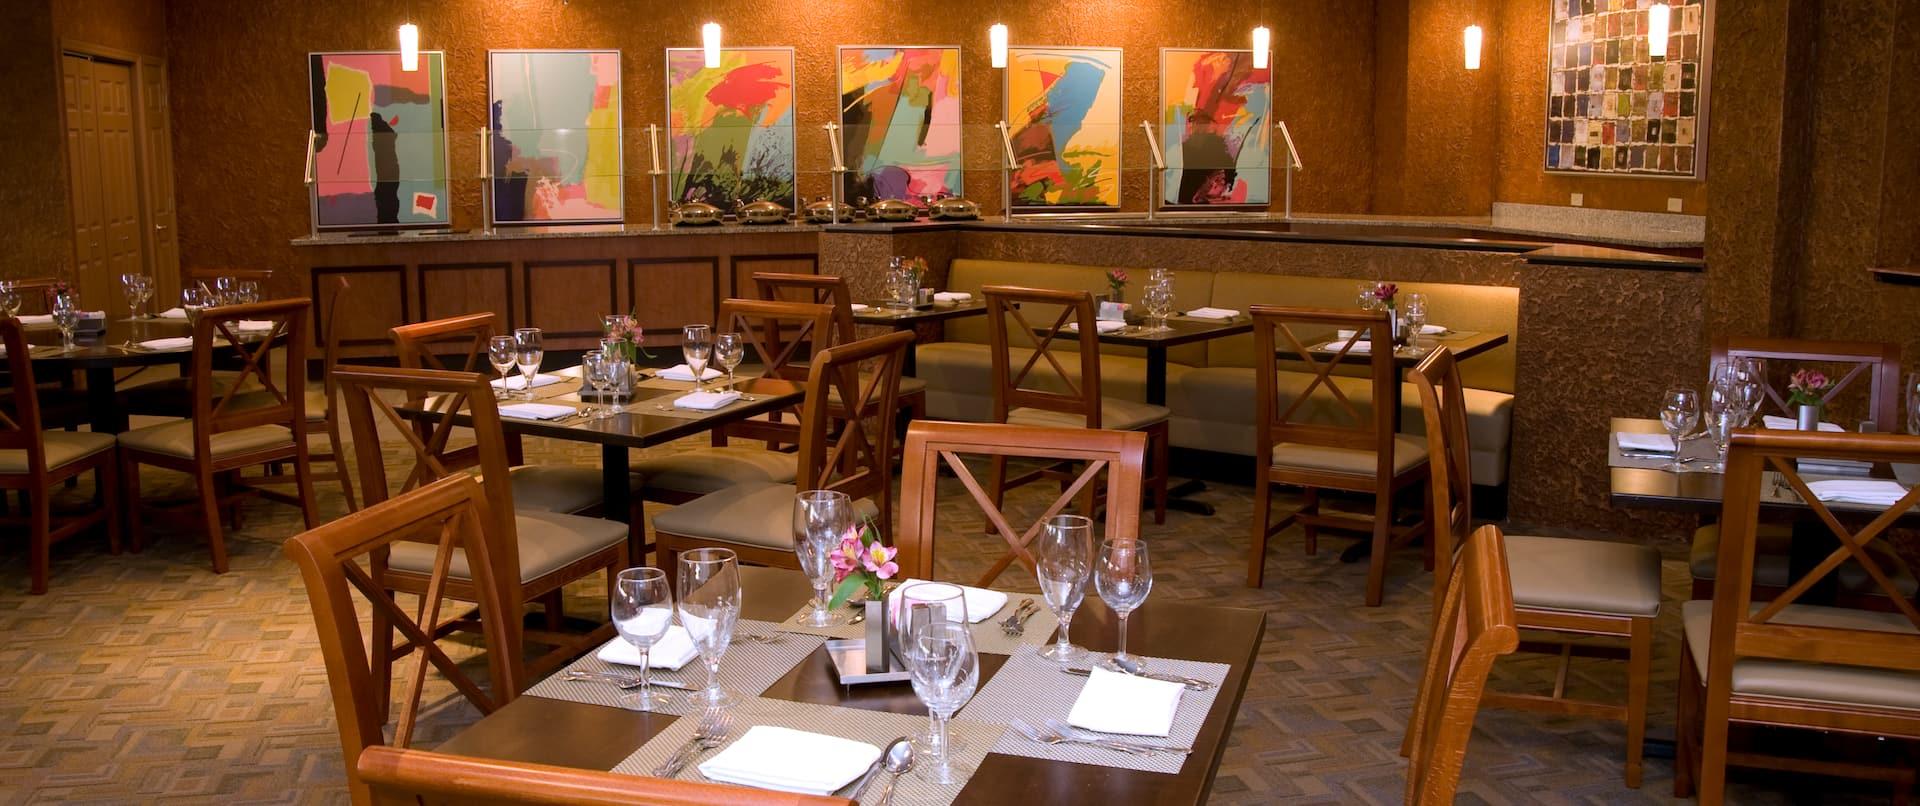 Copperfields Restaurant Dining Room